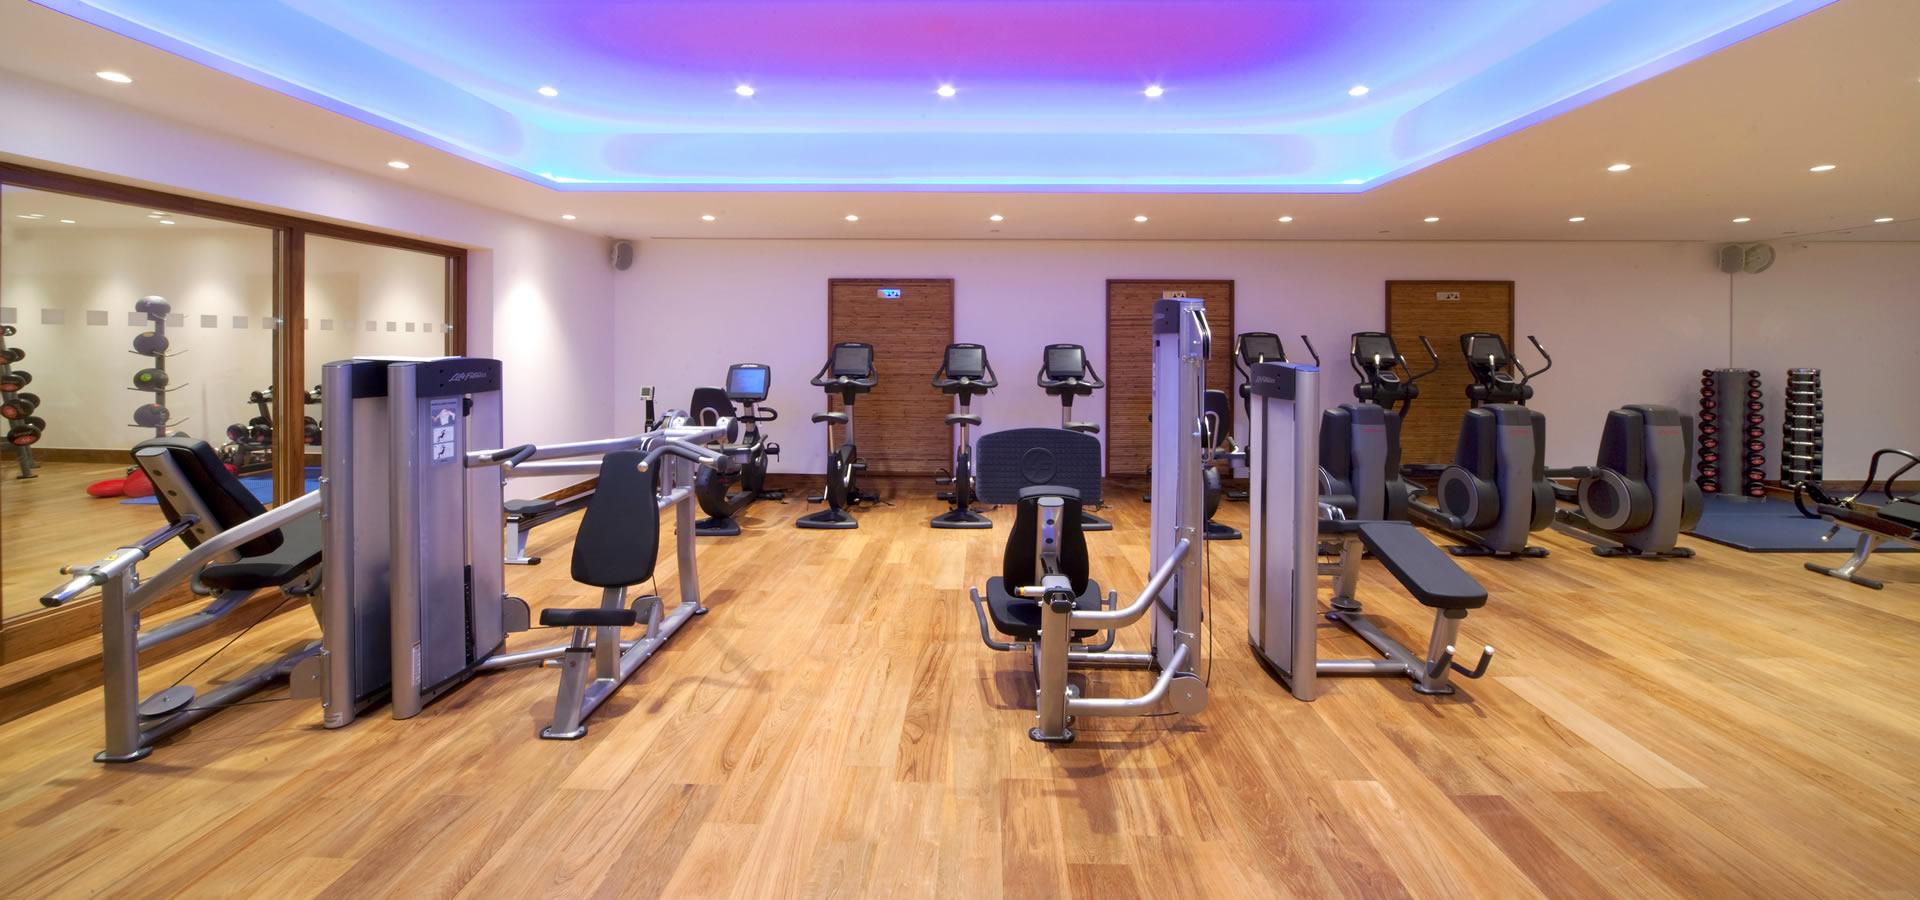 Tower Bridge Health and Fitness Club | Pool & Gym near ...